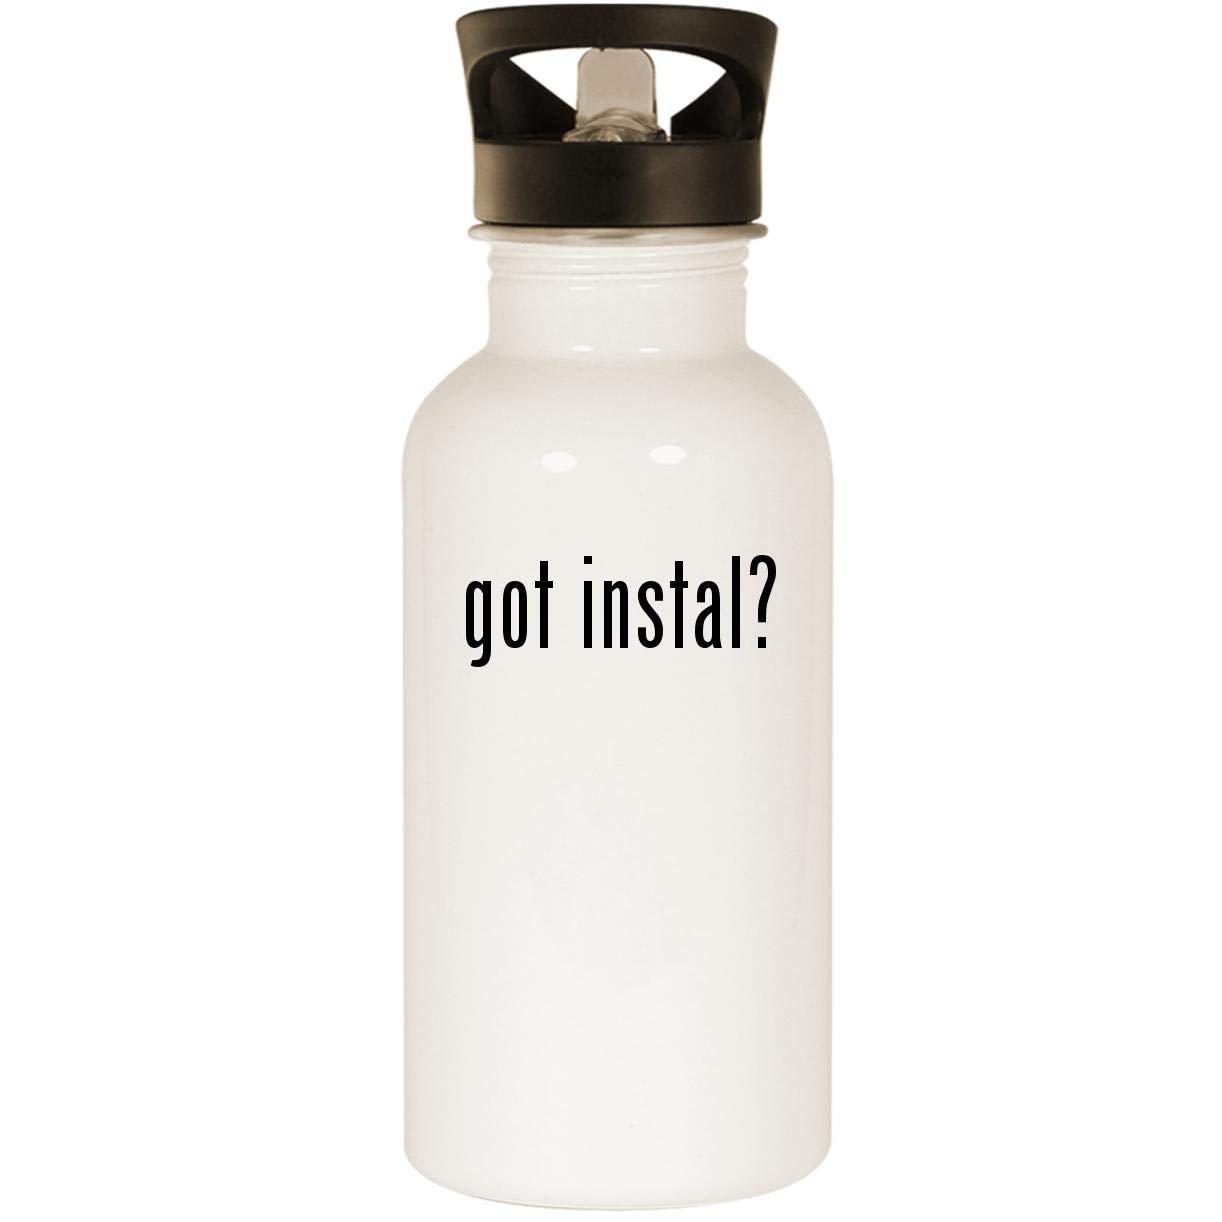 got instal? - Stainless Steel 20oz Road Ready Water Bottle, White